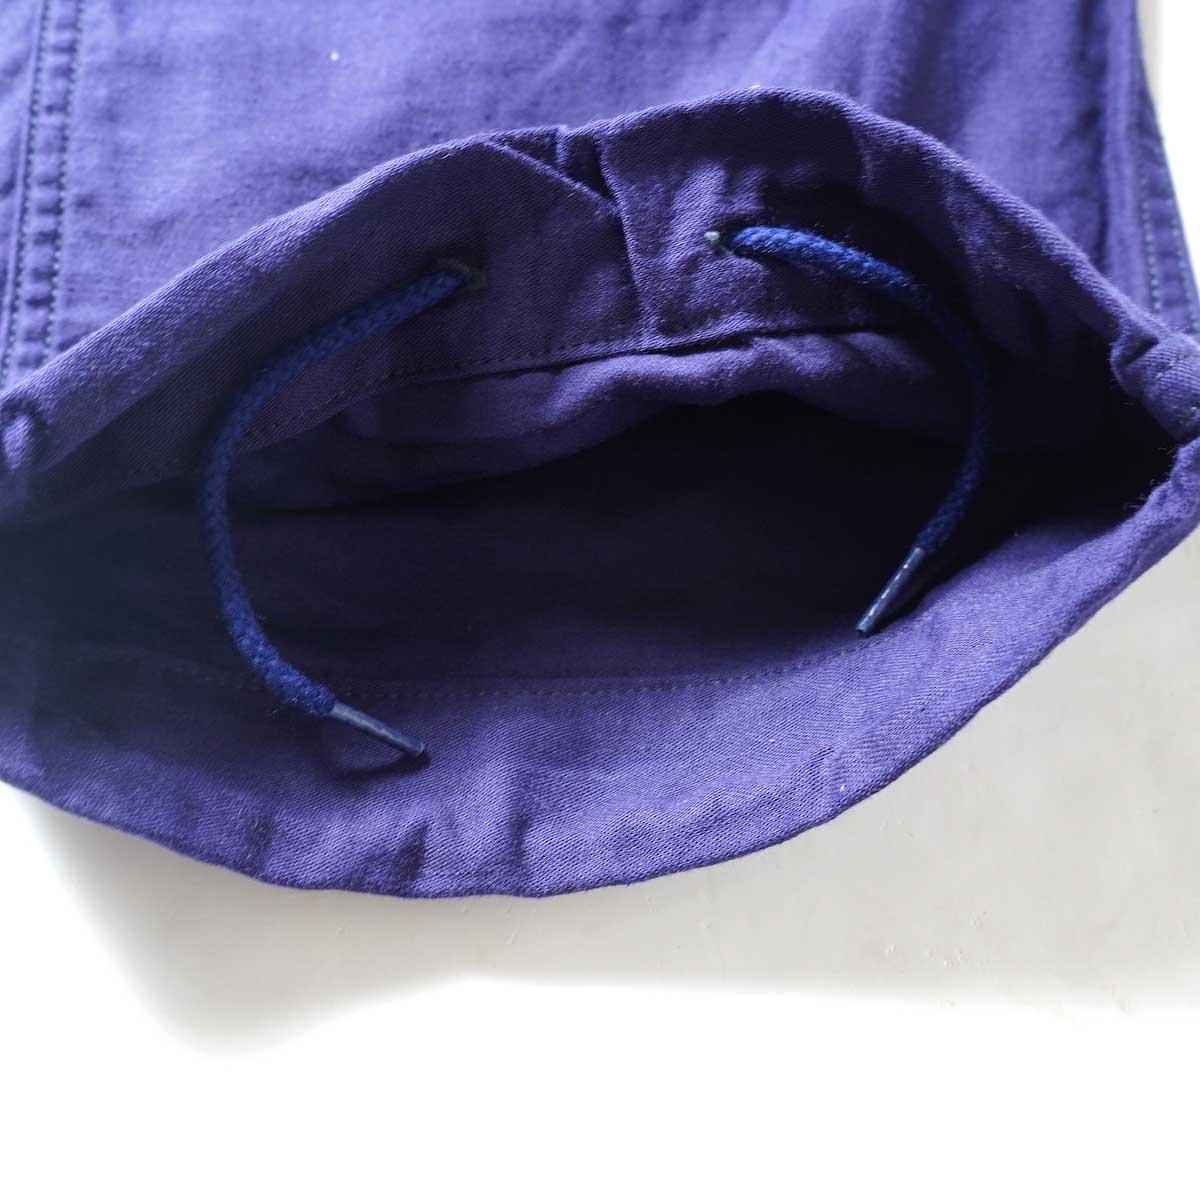 Needles / STRING FATIGUE PANT - BACK SATEEN (Navy)裾内側